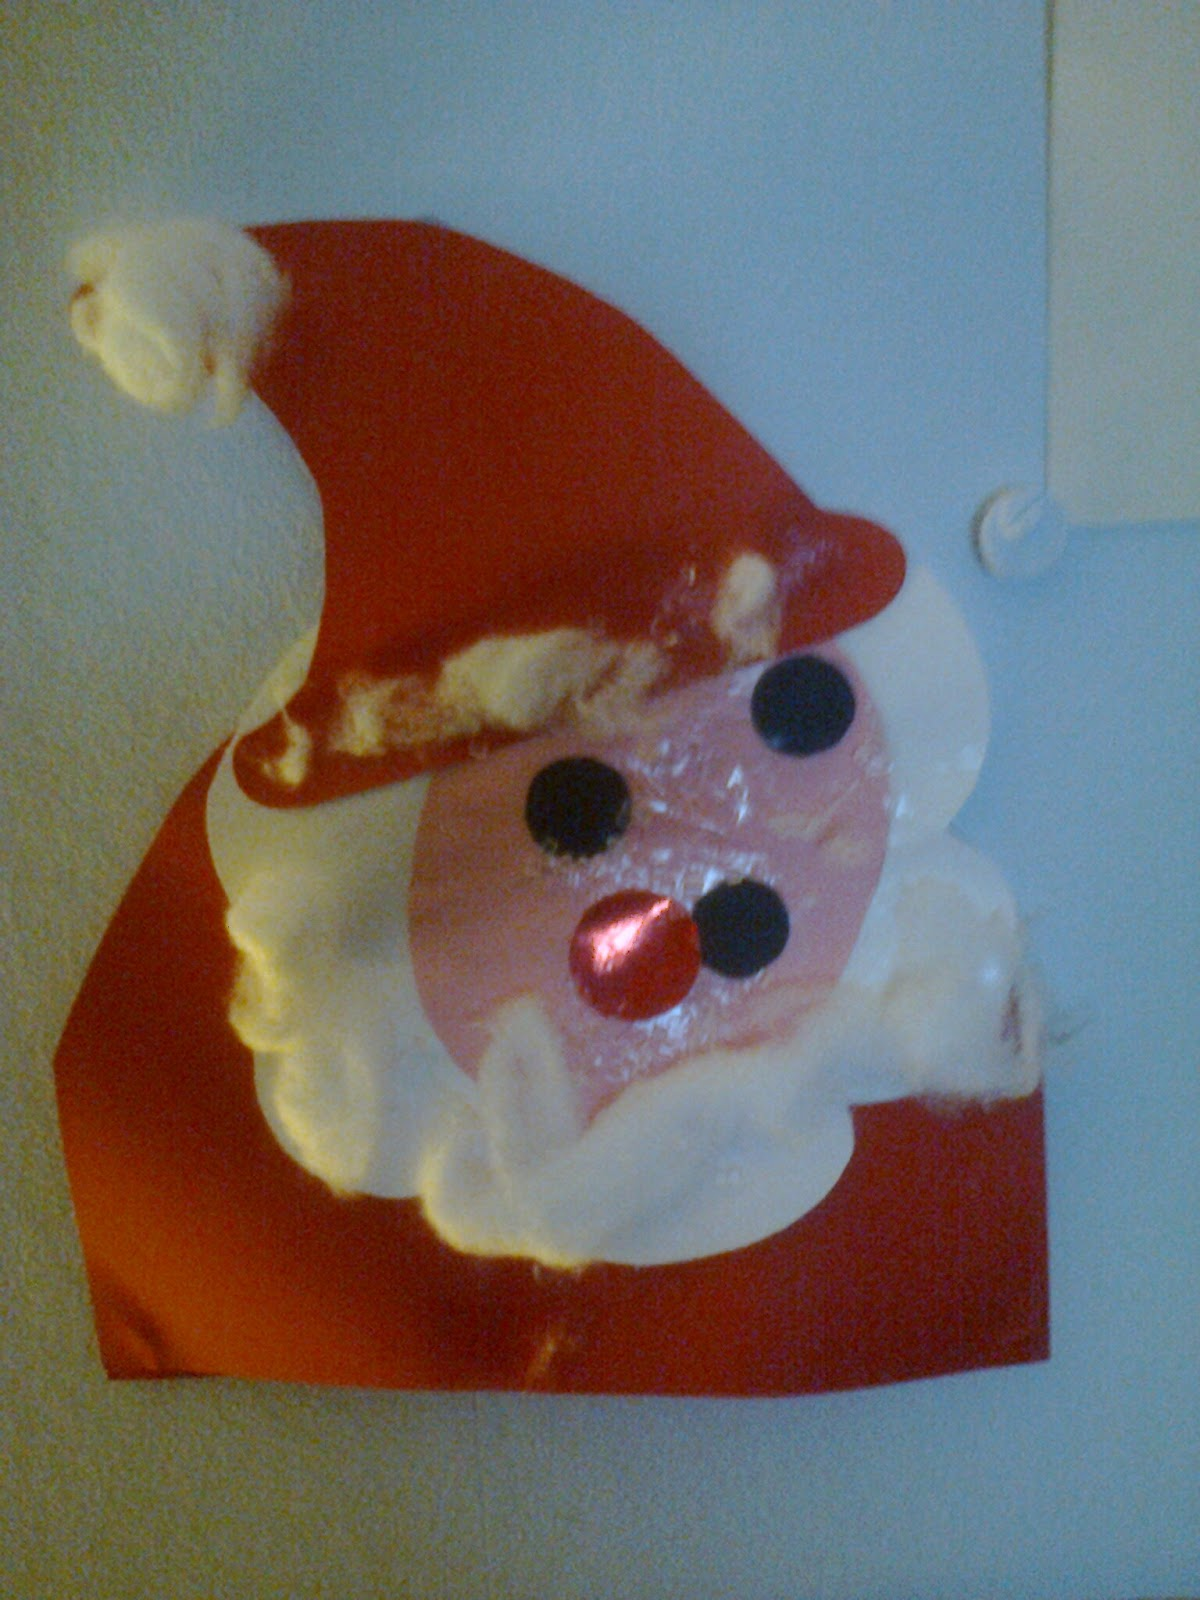 Santa - I think